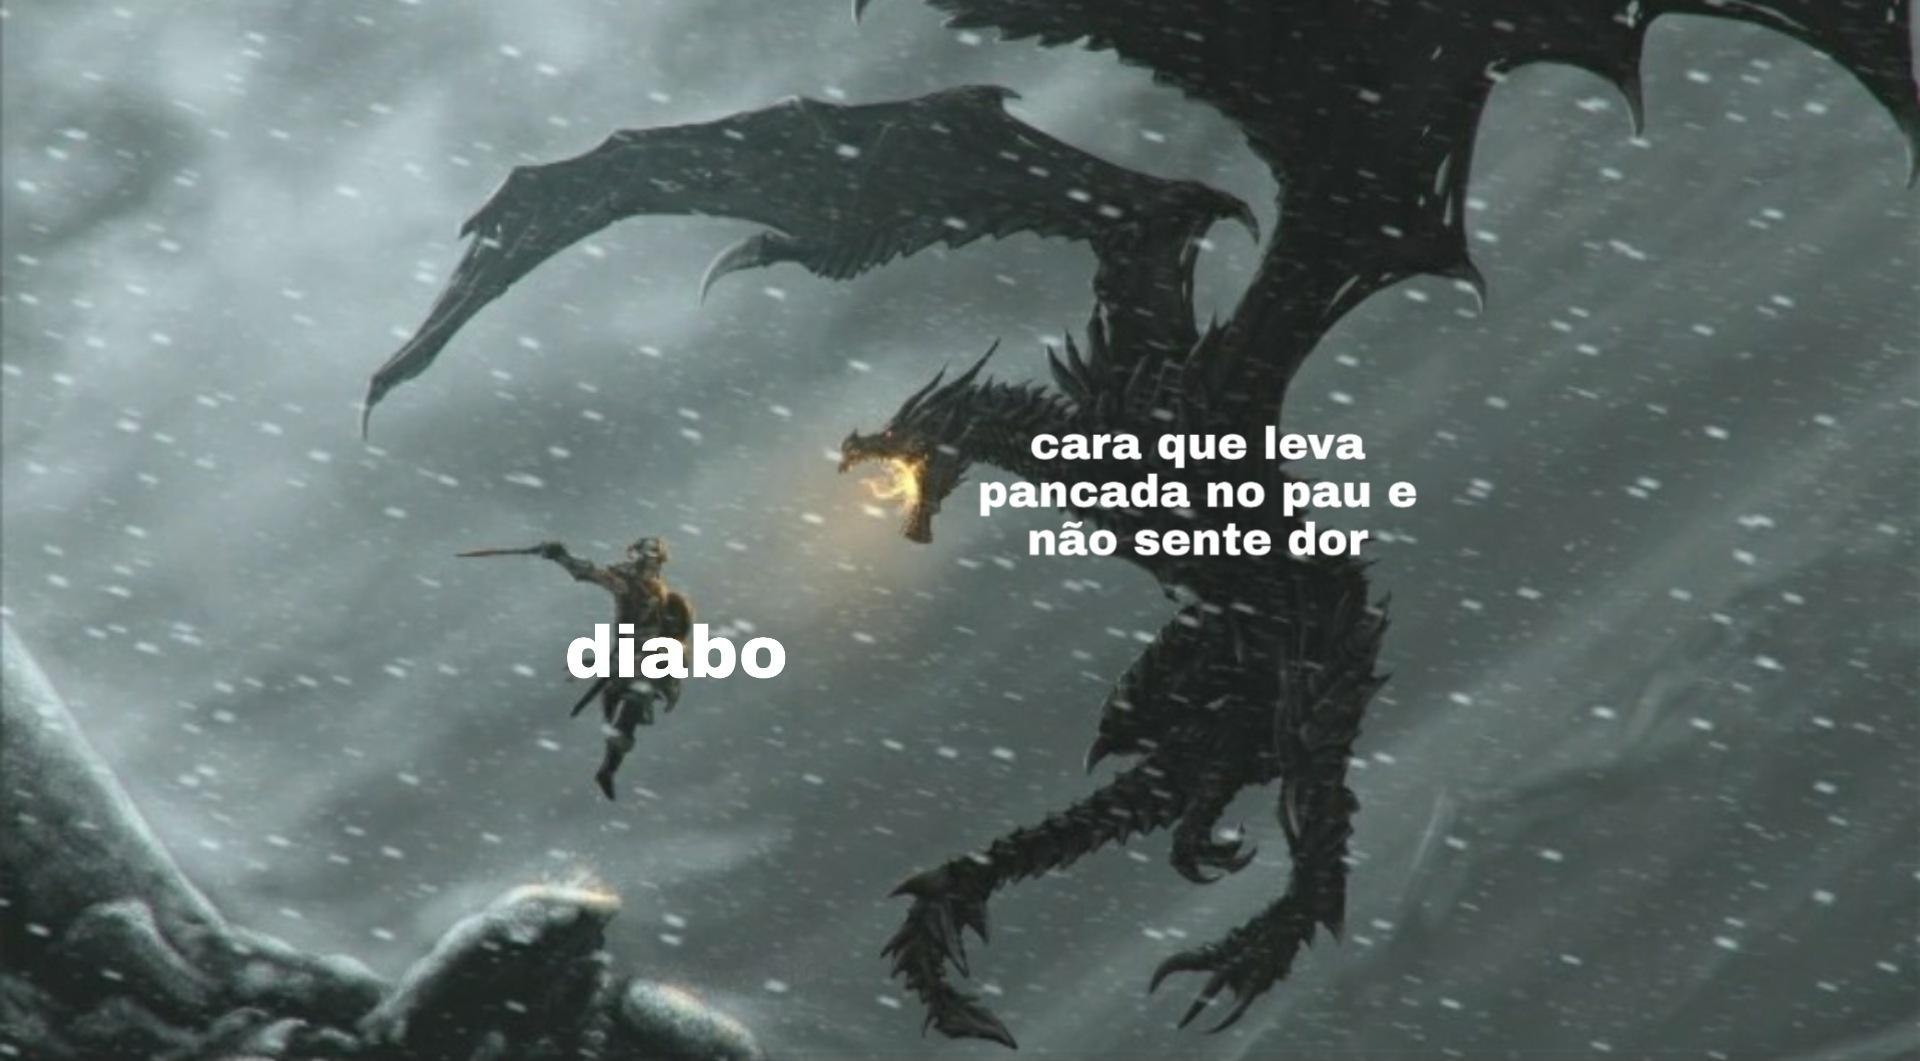 Meu primeiro meme